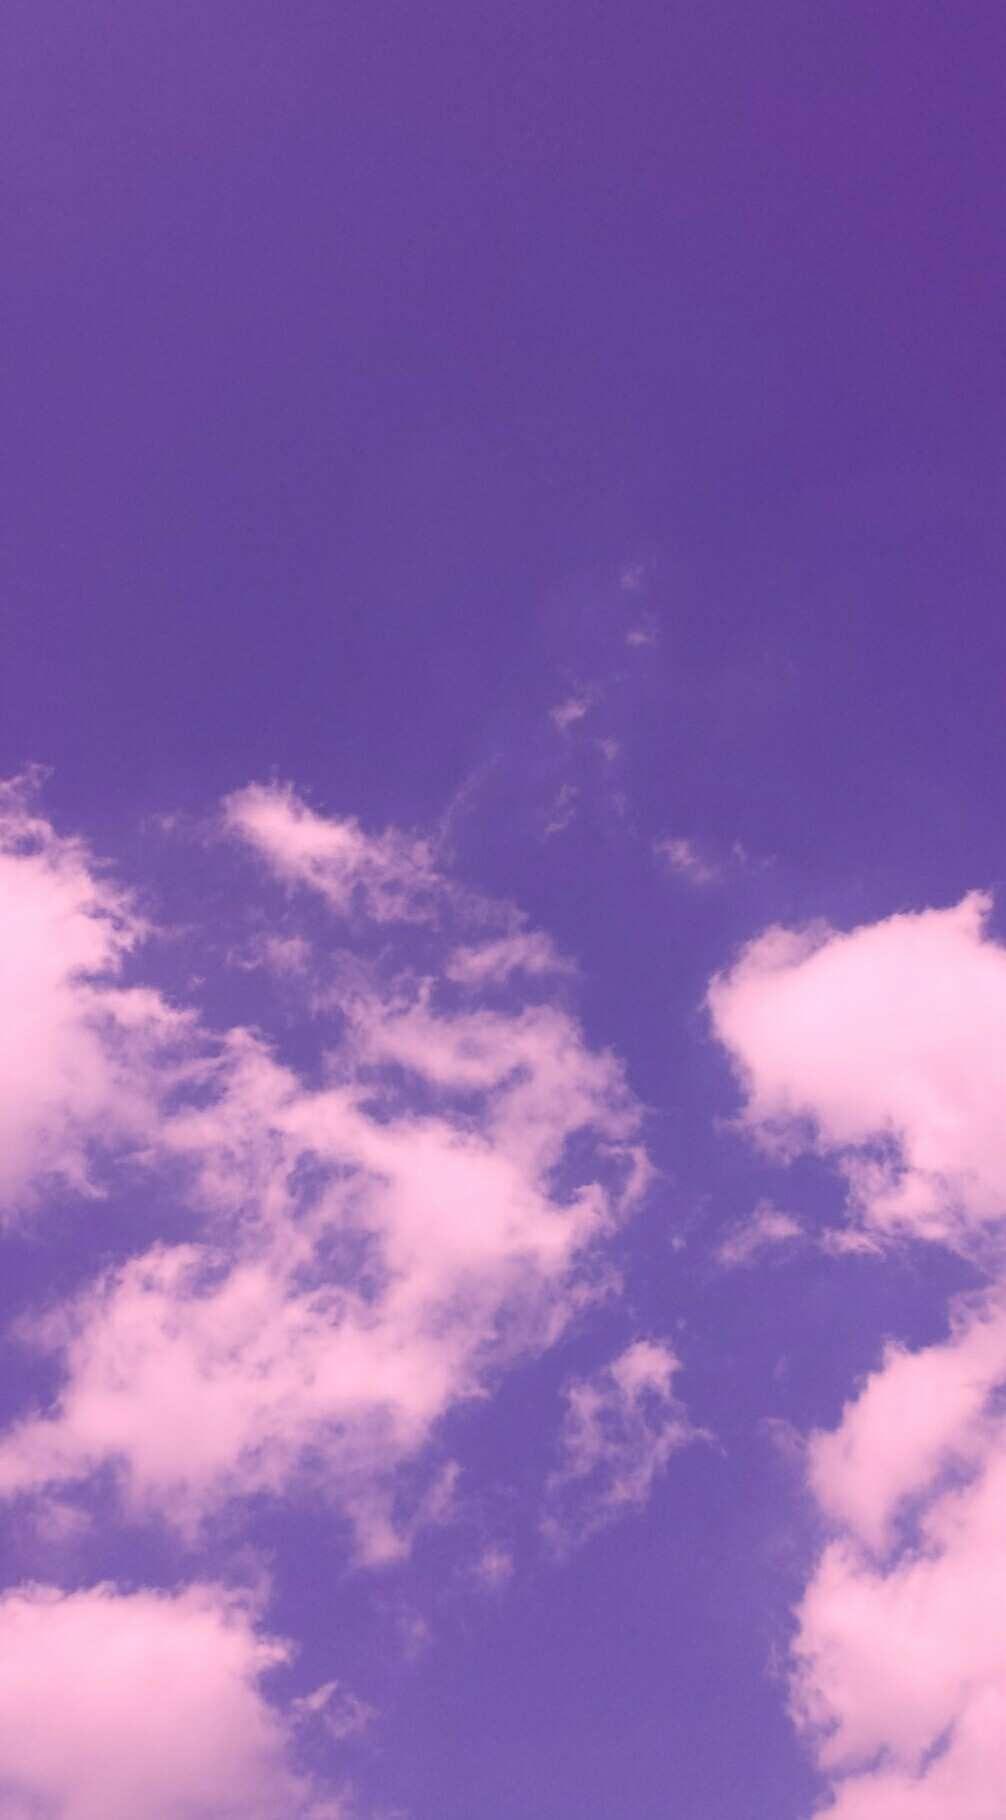 Https All Images Net Wallpaper Iphone Aesthetic Hd 173 Wallpaper Iphone Aesthetic Iphone Wallpaper Tumblr Aesthetic Purple Wallpaper Iphone Purple Wallpaper